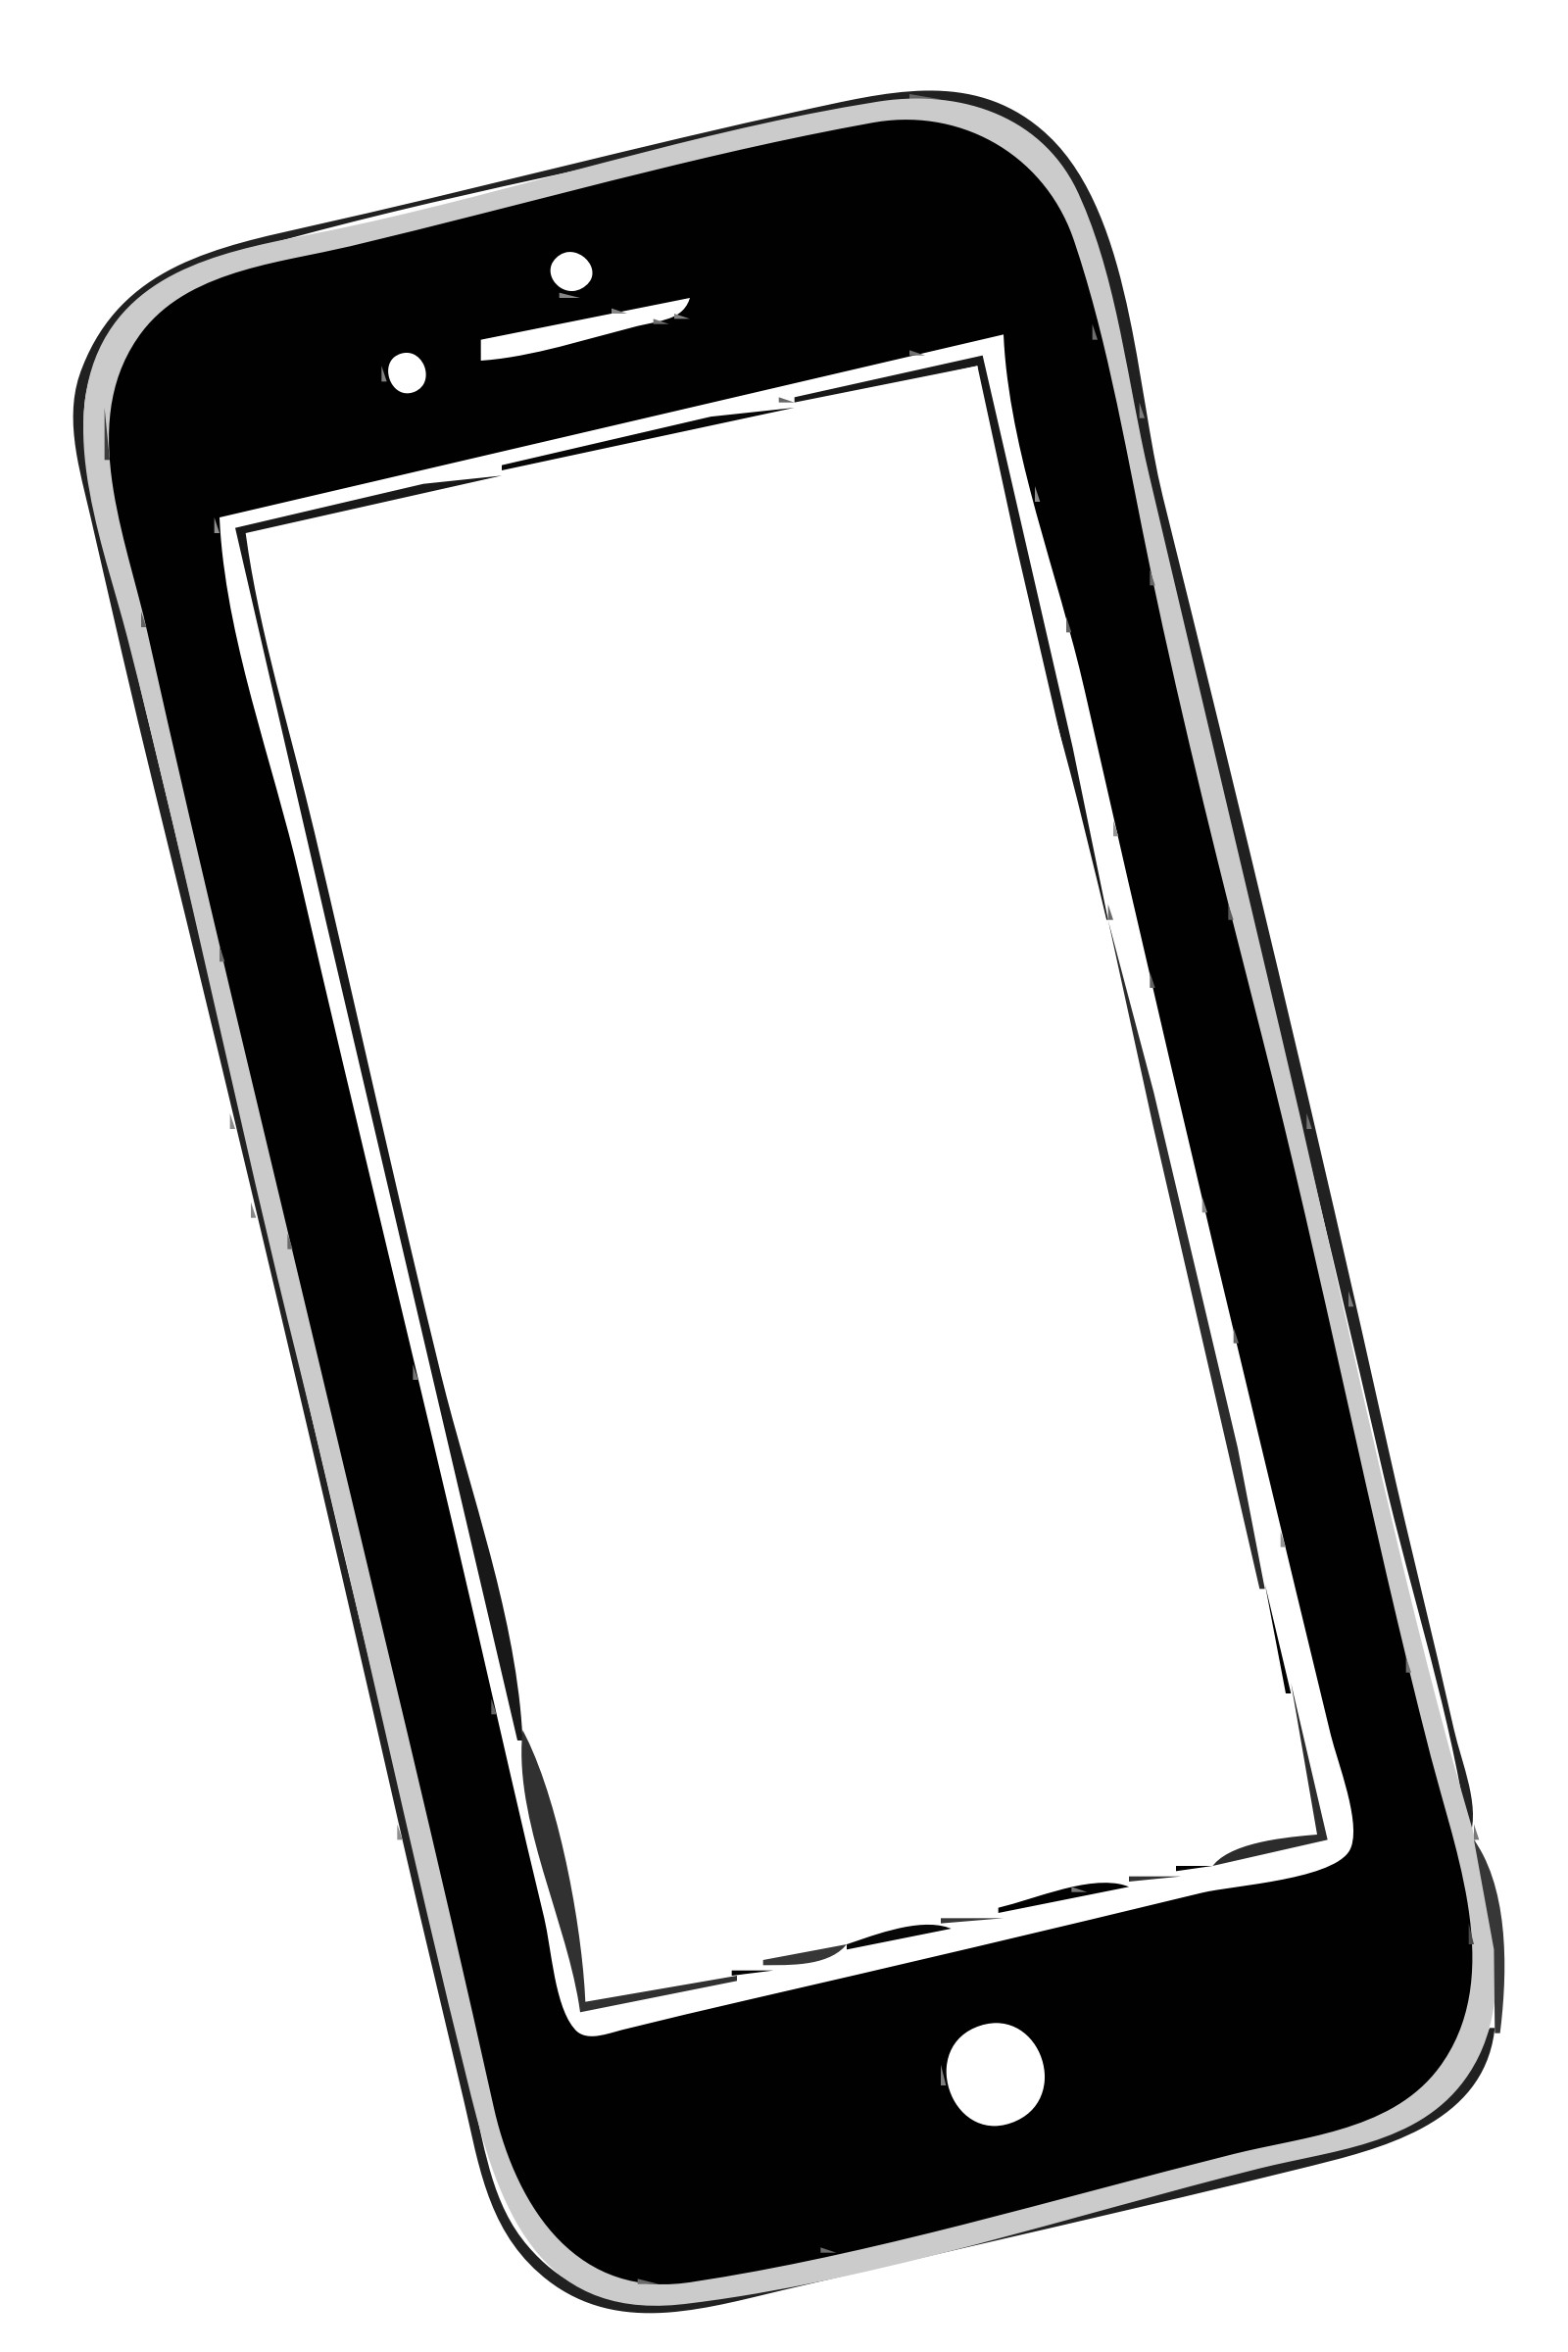 Phone clipart phone.